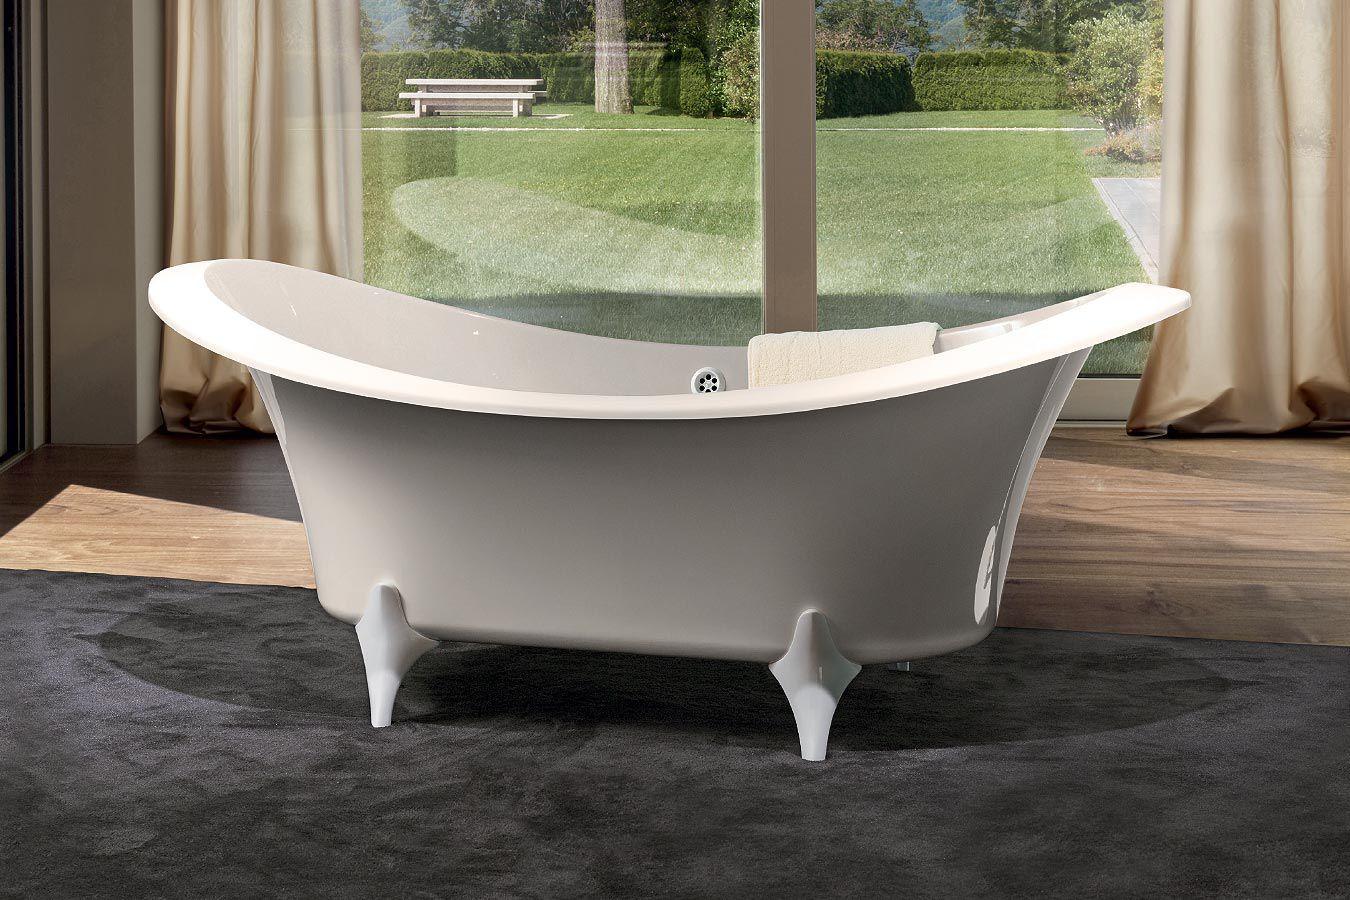 Vasca Da Bagno Rettangolare Grande : Vasche da bagno e vasche idromassaggio gruppo treesse